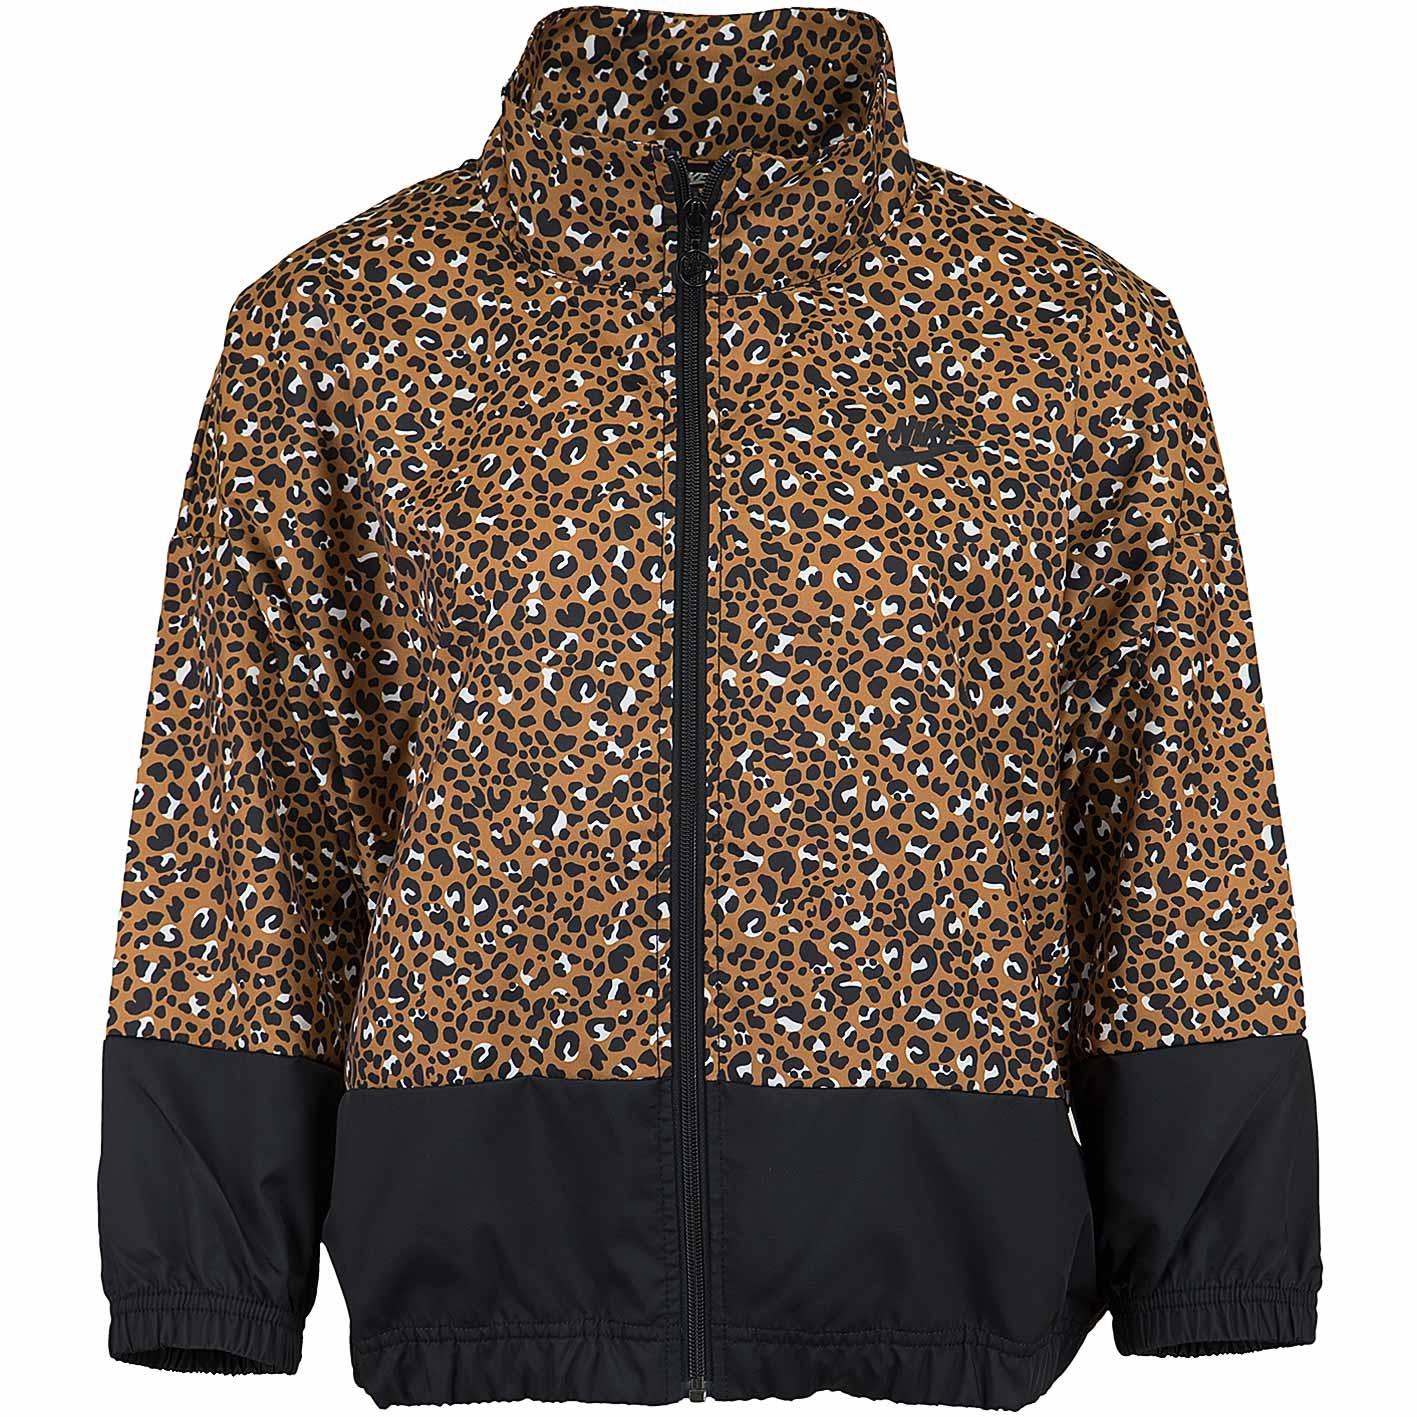 newest a5c96 d06f0 Nike Damen Trainingsjacke Jacke Animal Woven braun/schwarz